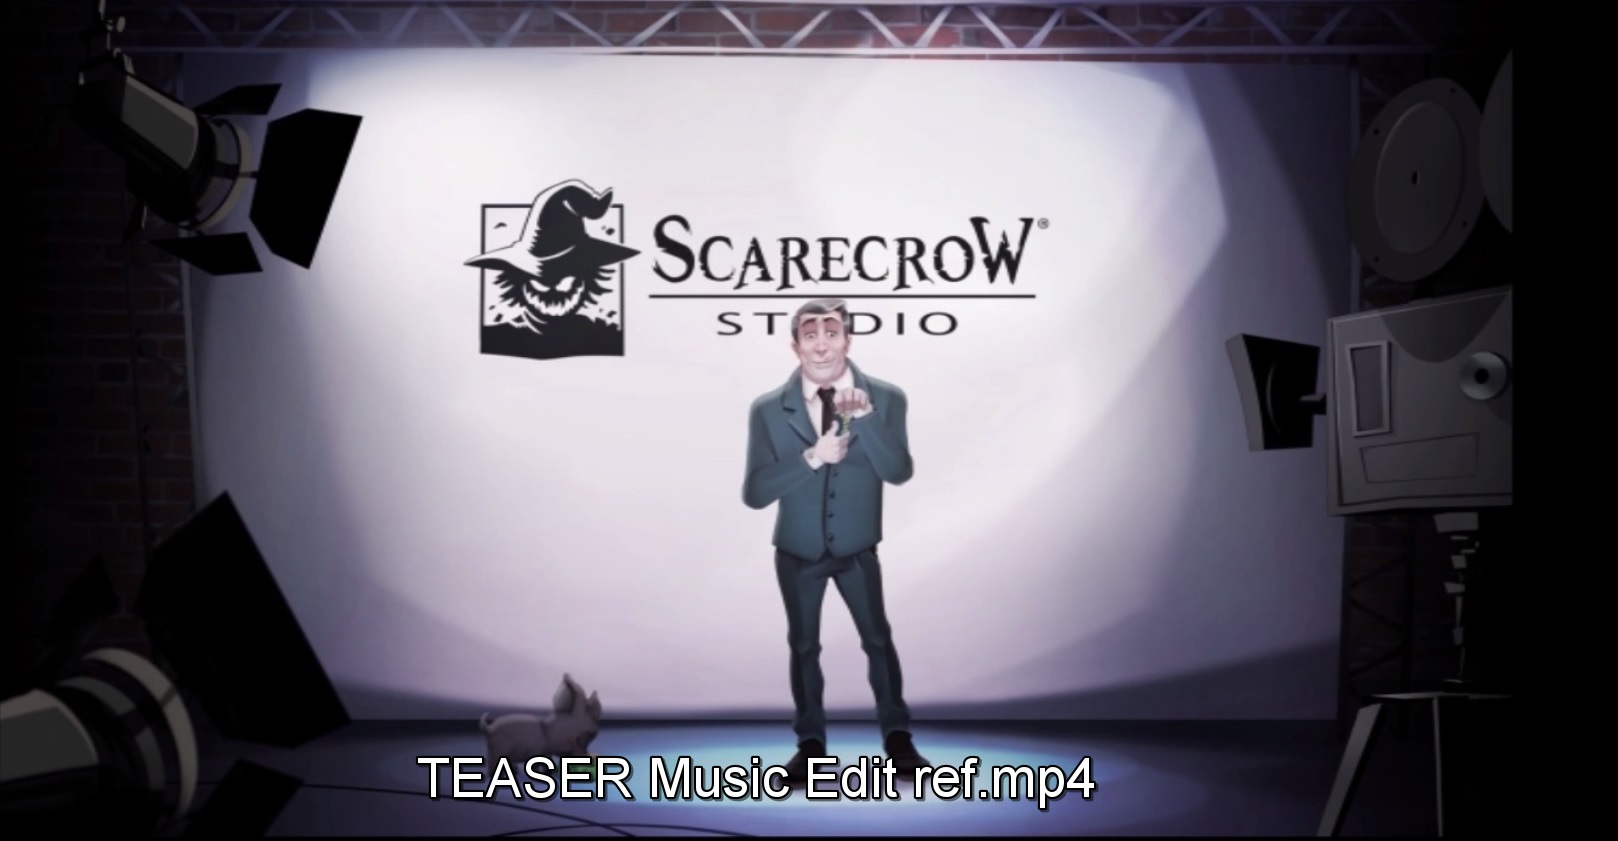 3 minutes to midnight - teaser trailer - blog image - scarecrow studio